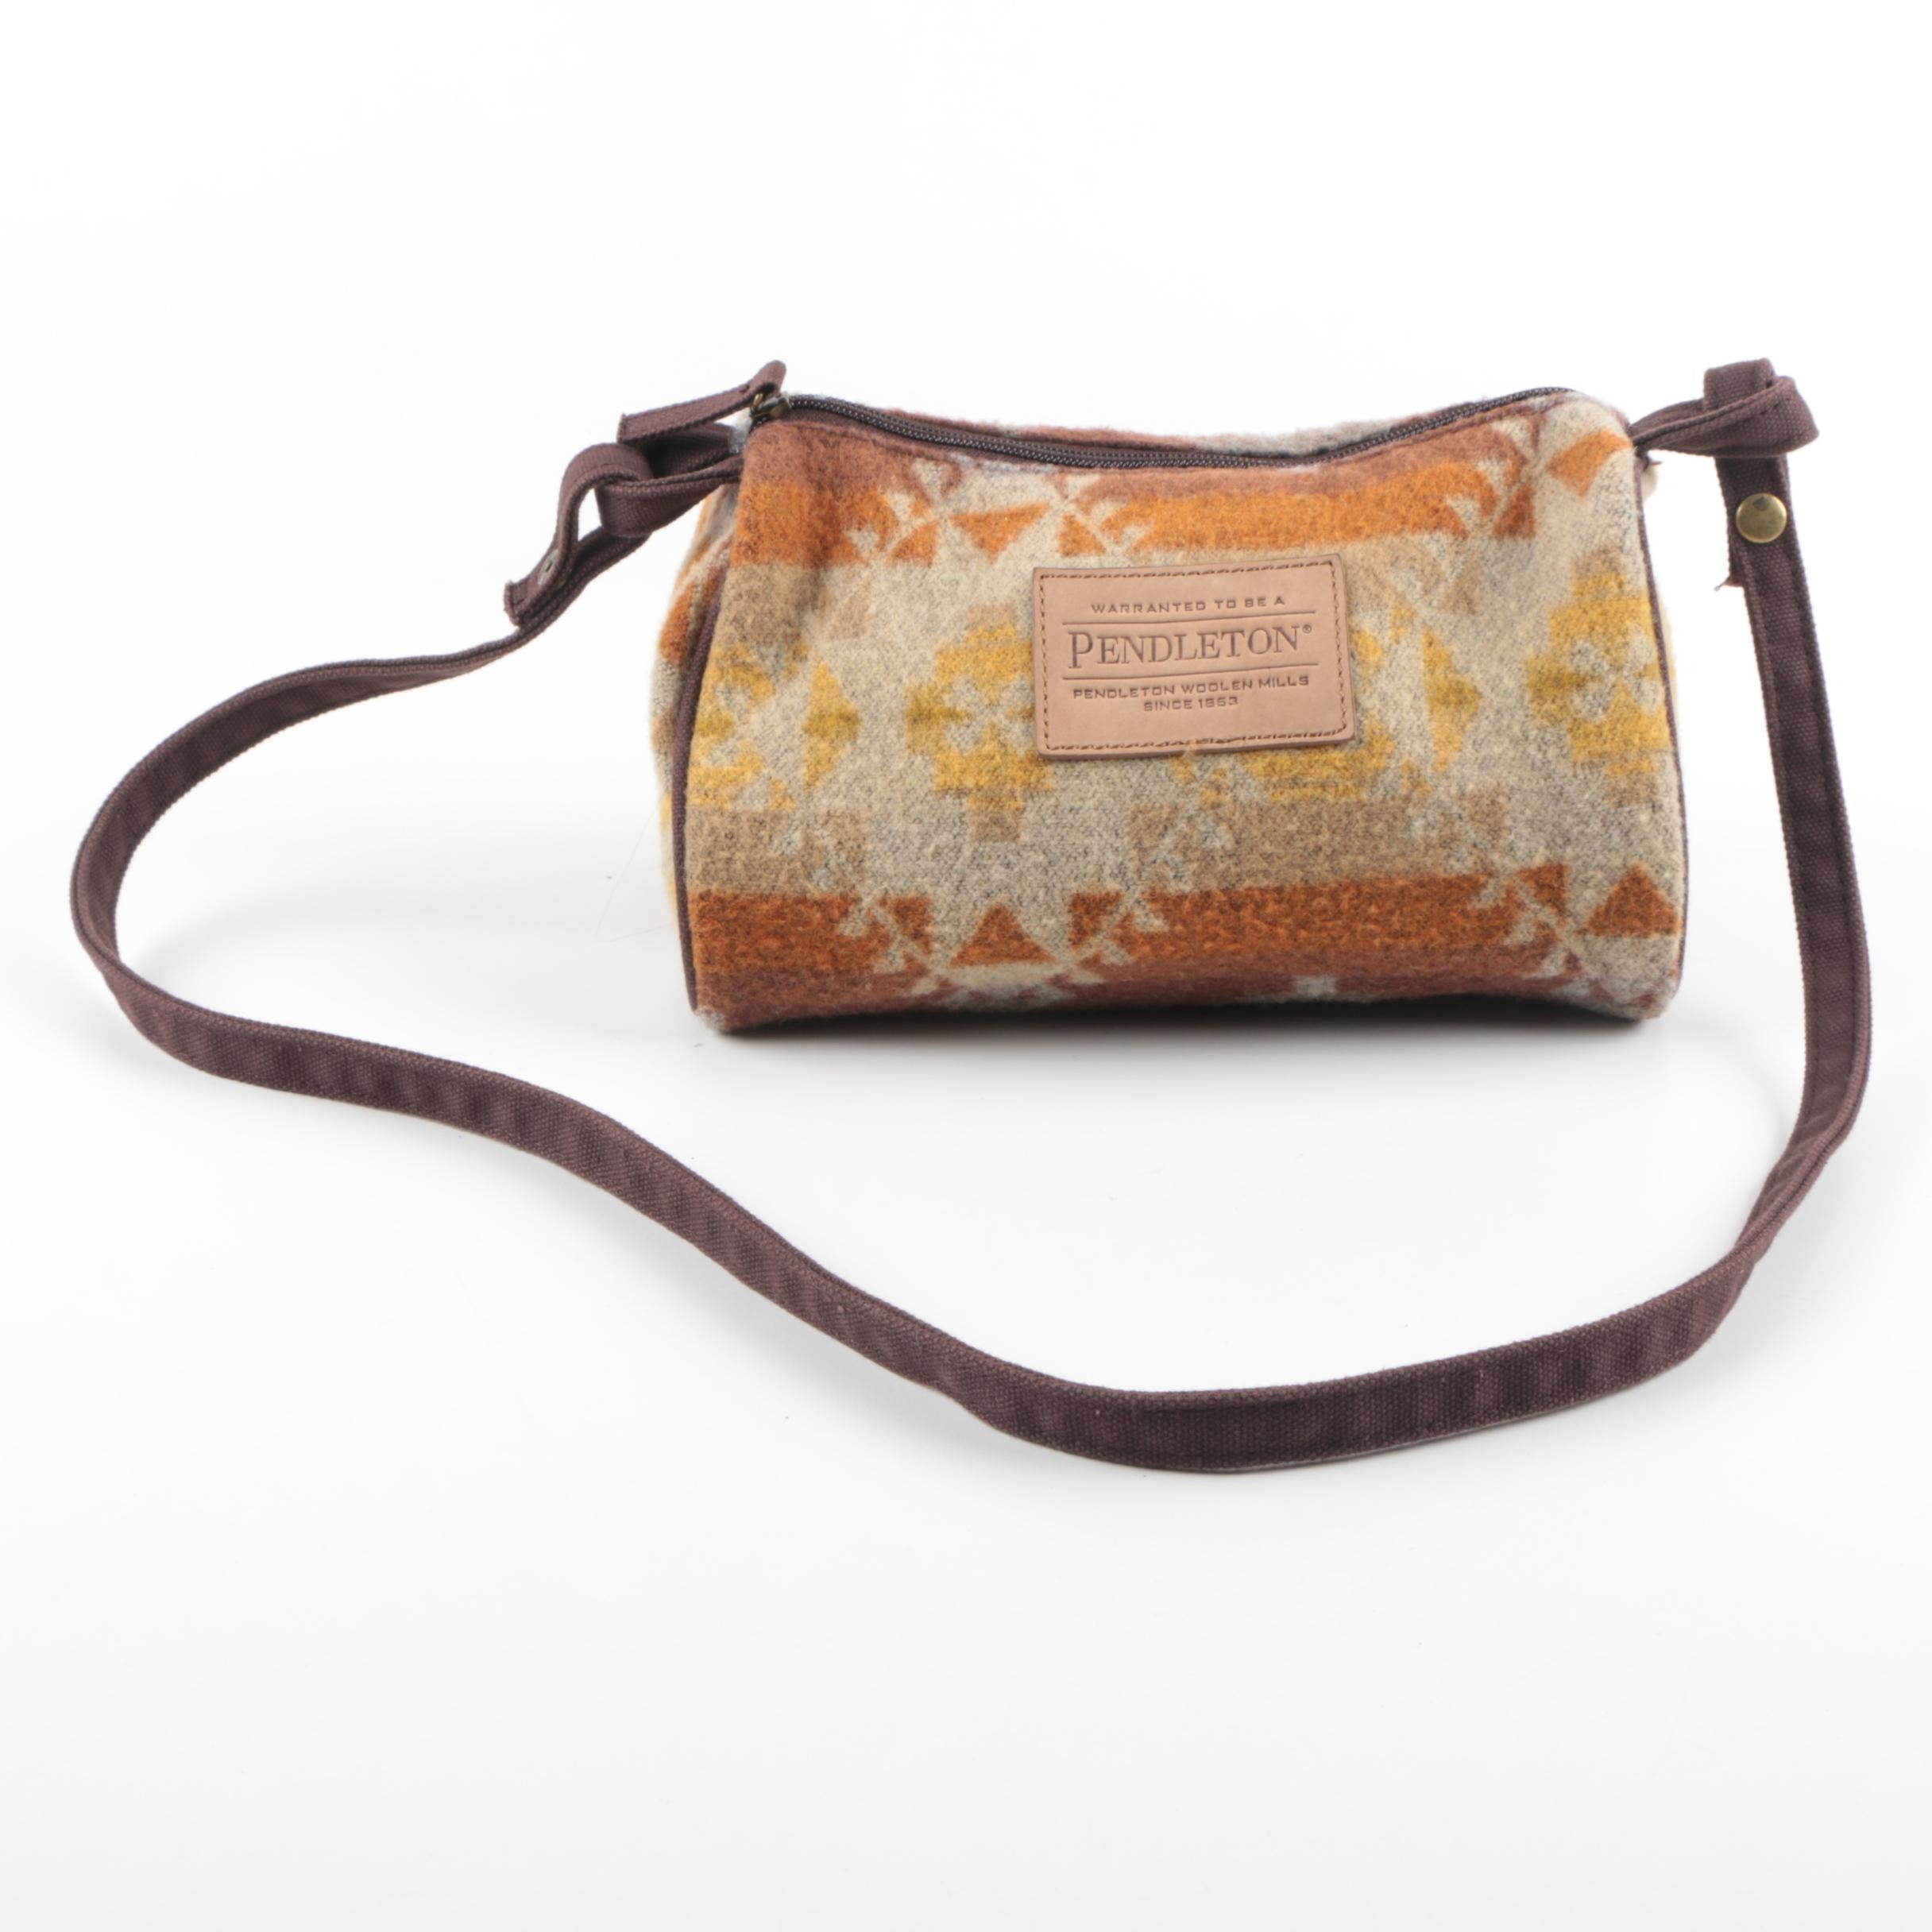 Pendleton Wool Shoulder Bag